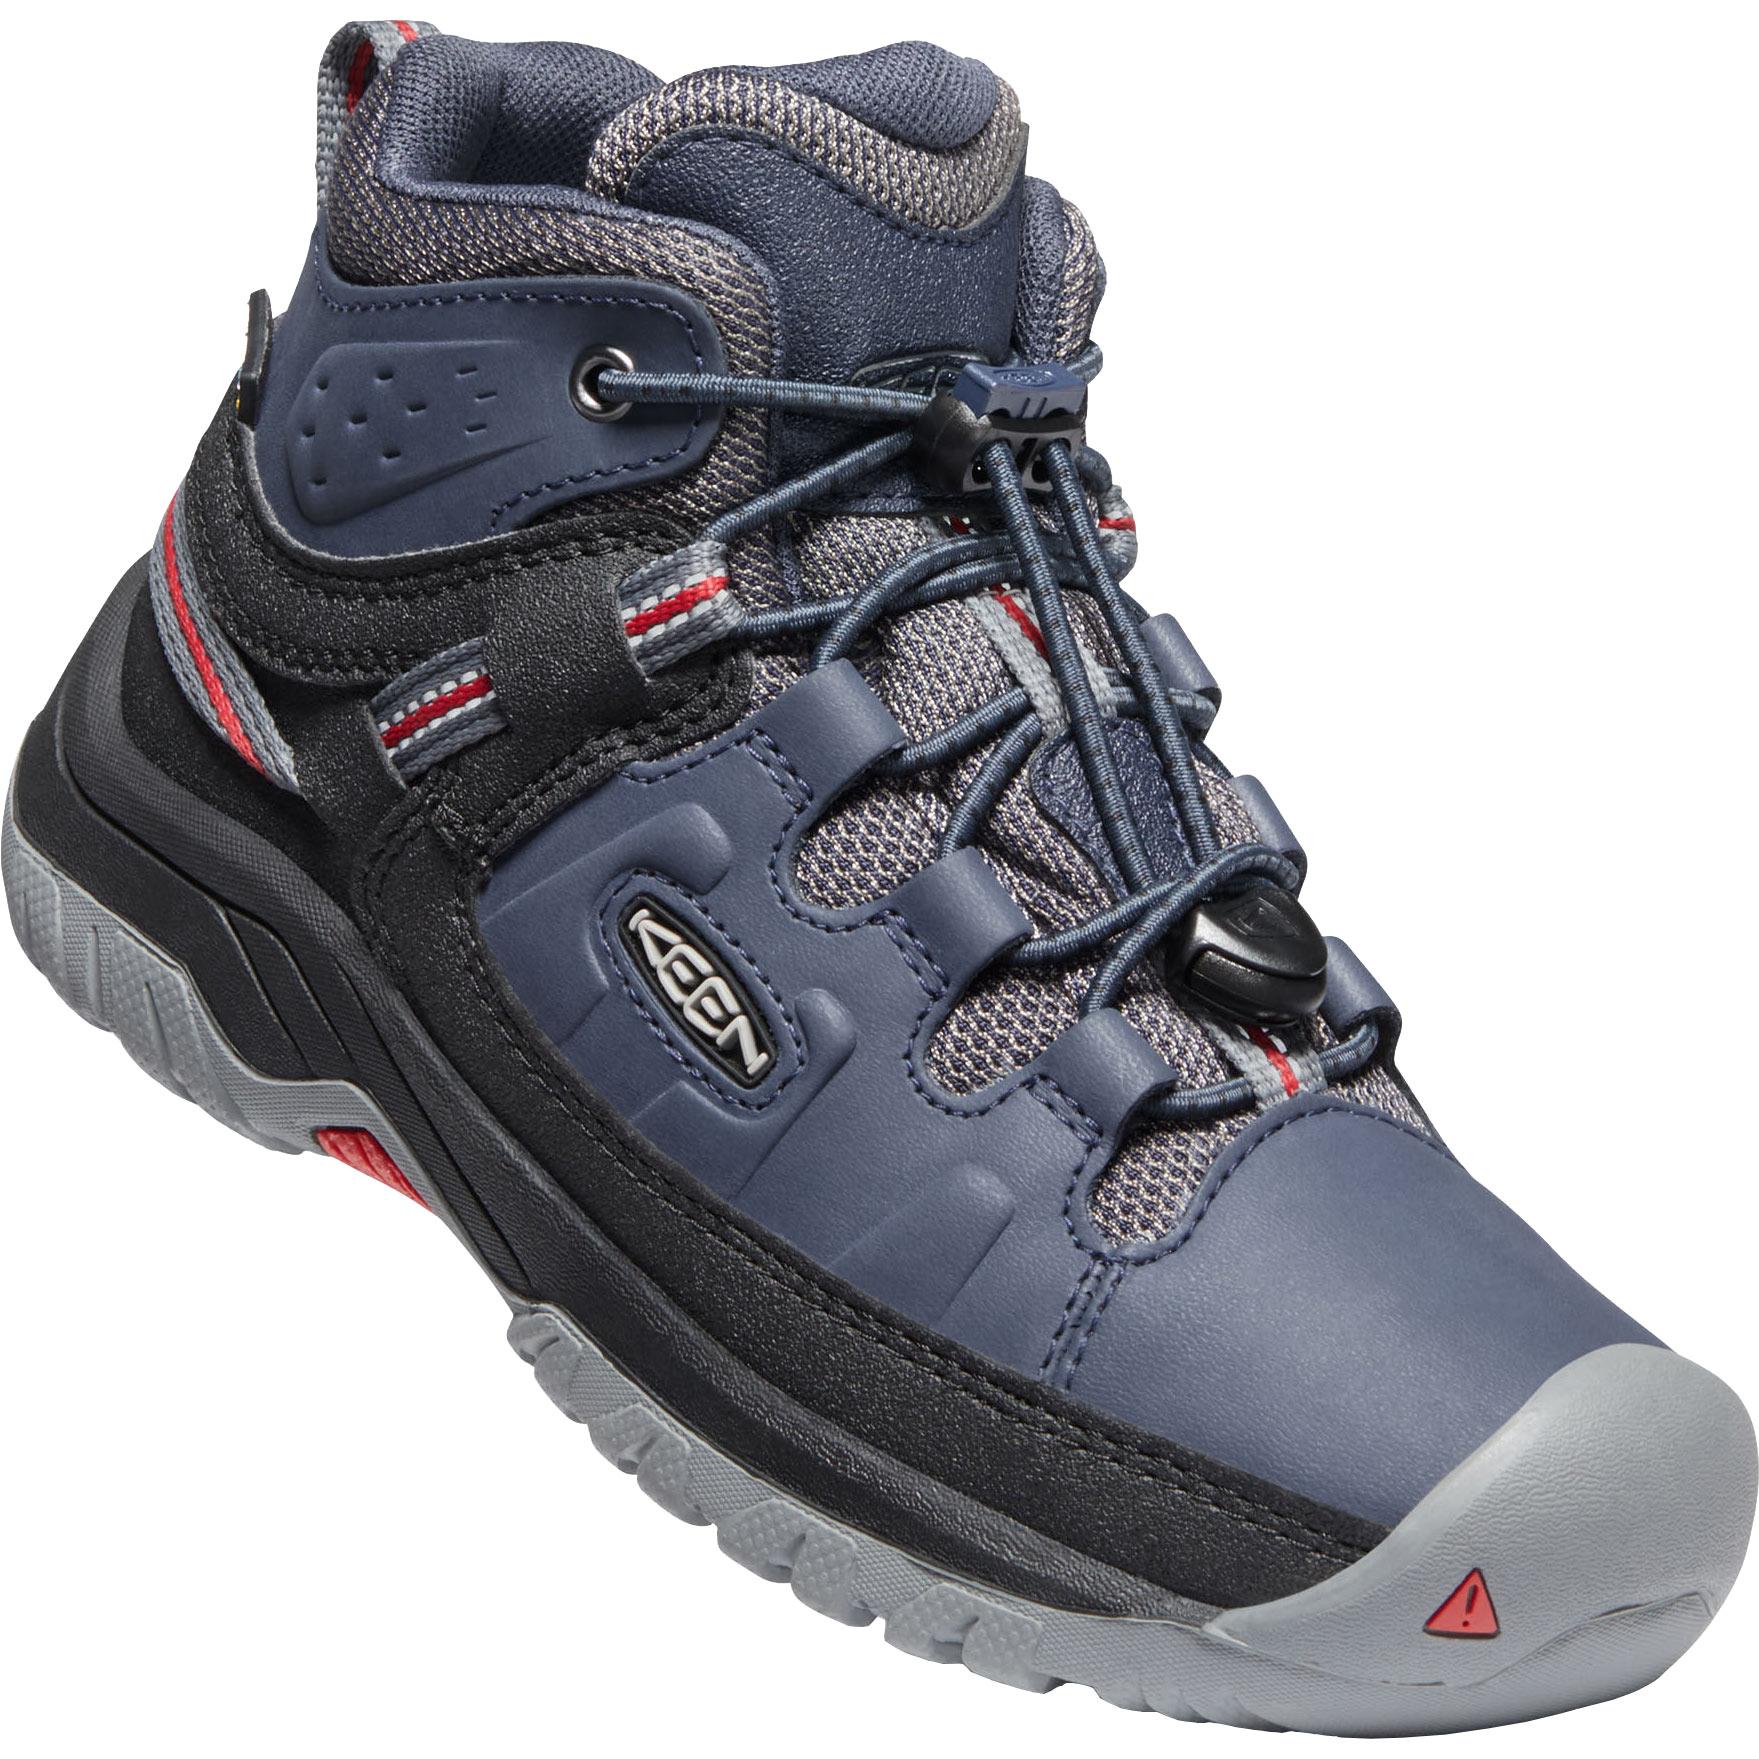 KEEN Targhee Mid Waterproof Youth Hiking Ankle Boot - Blue Nights / Red Carpet